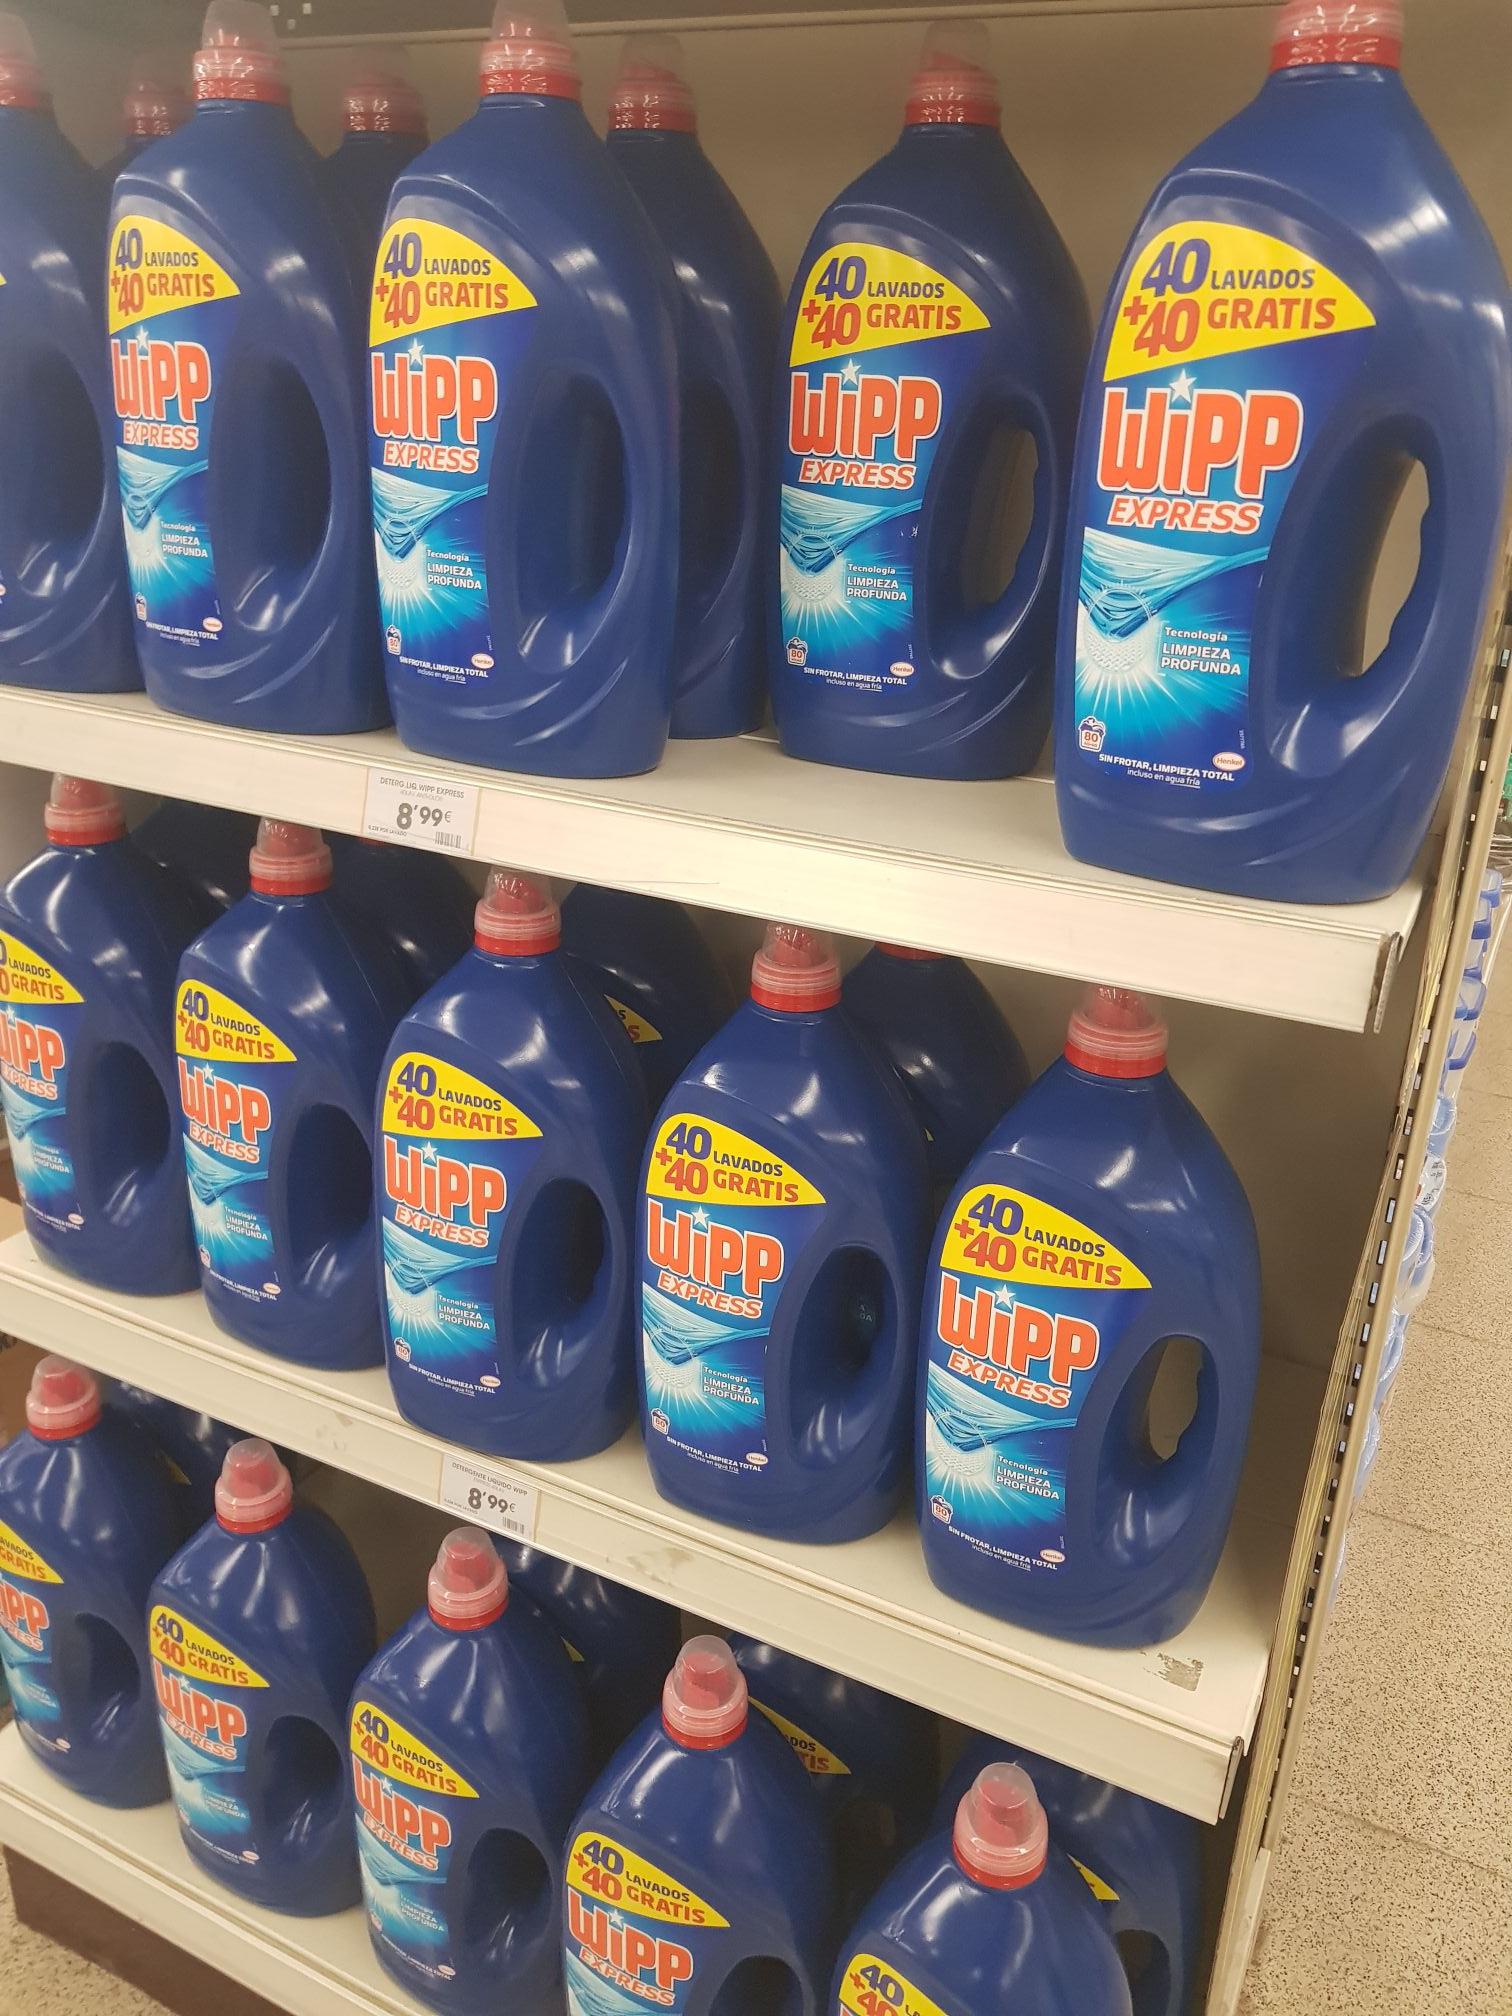 Wipp express 80 lavados